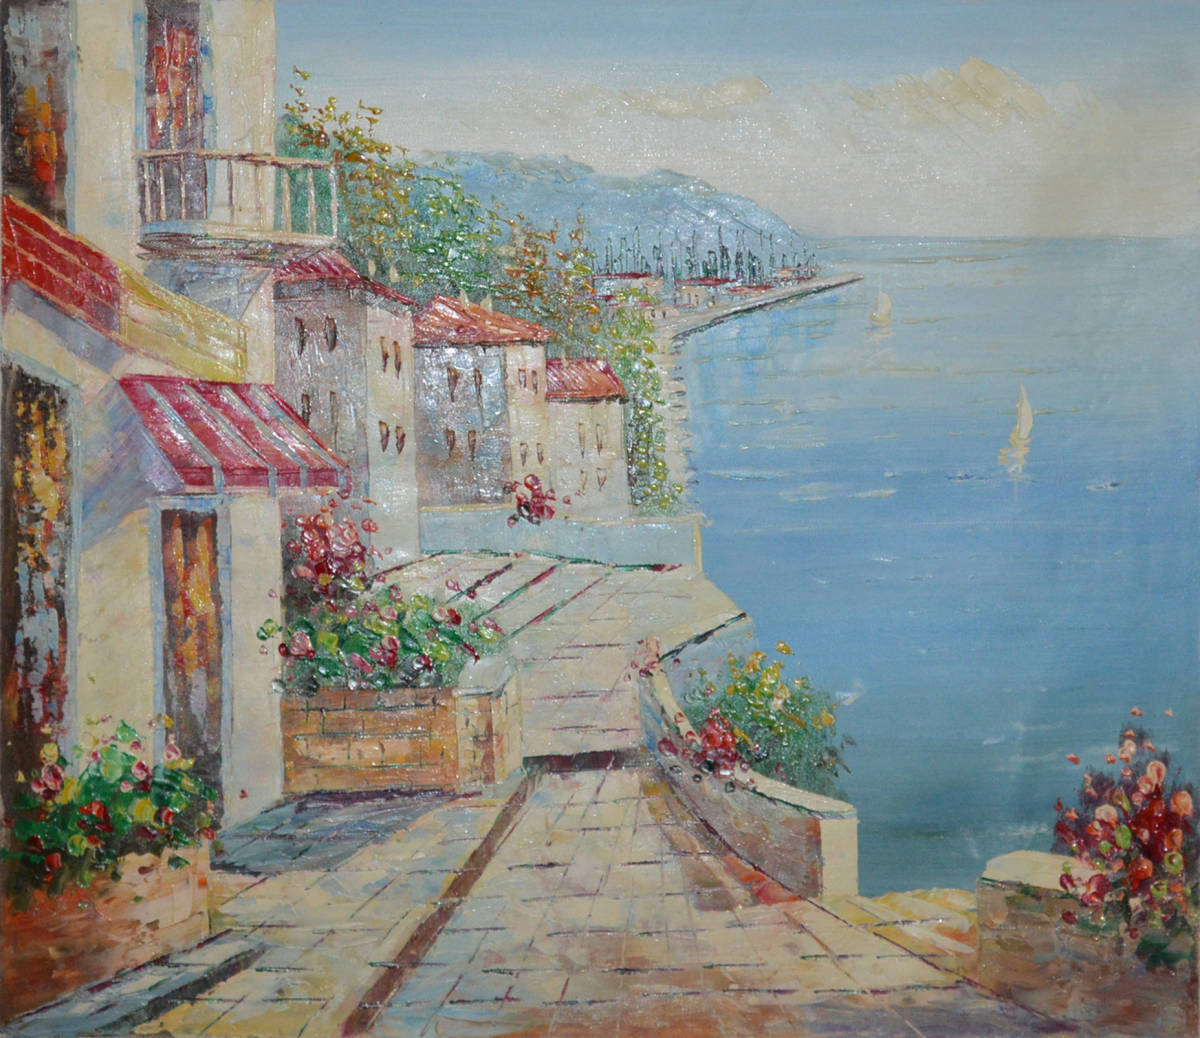 油絵 絵画 油彩 美術品 風景画 観光の海 肉筆 真作 F12 NO-77_画像2